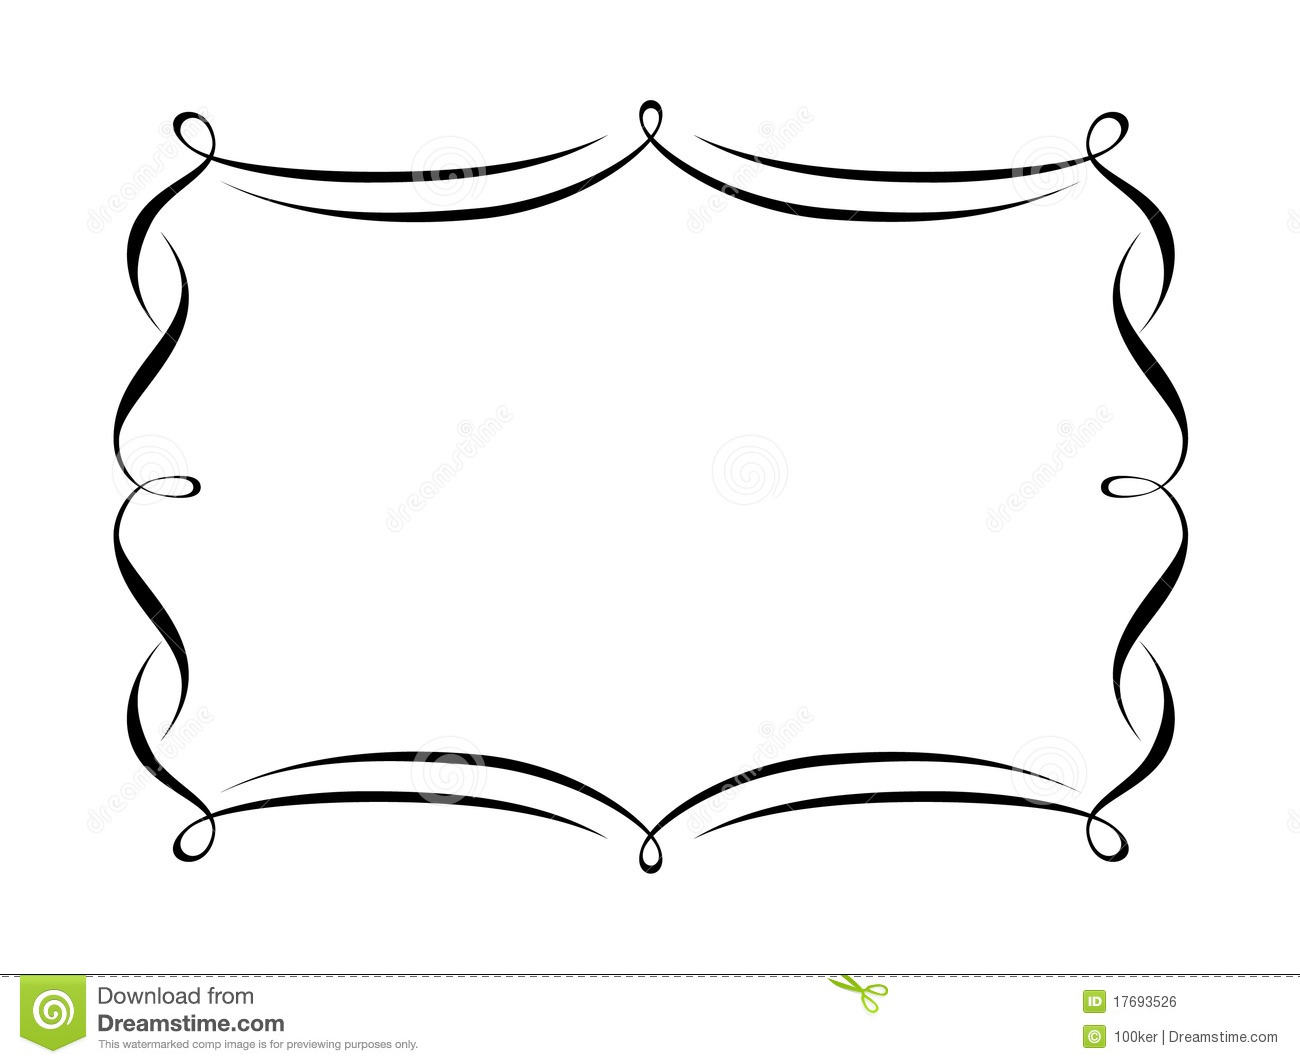 Shapes clipart frame #10